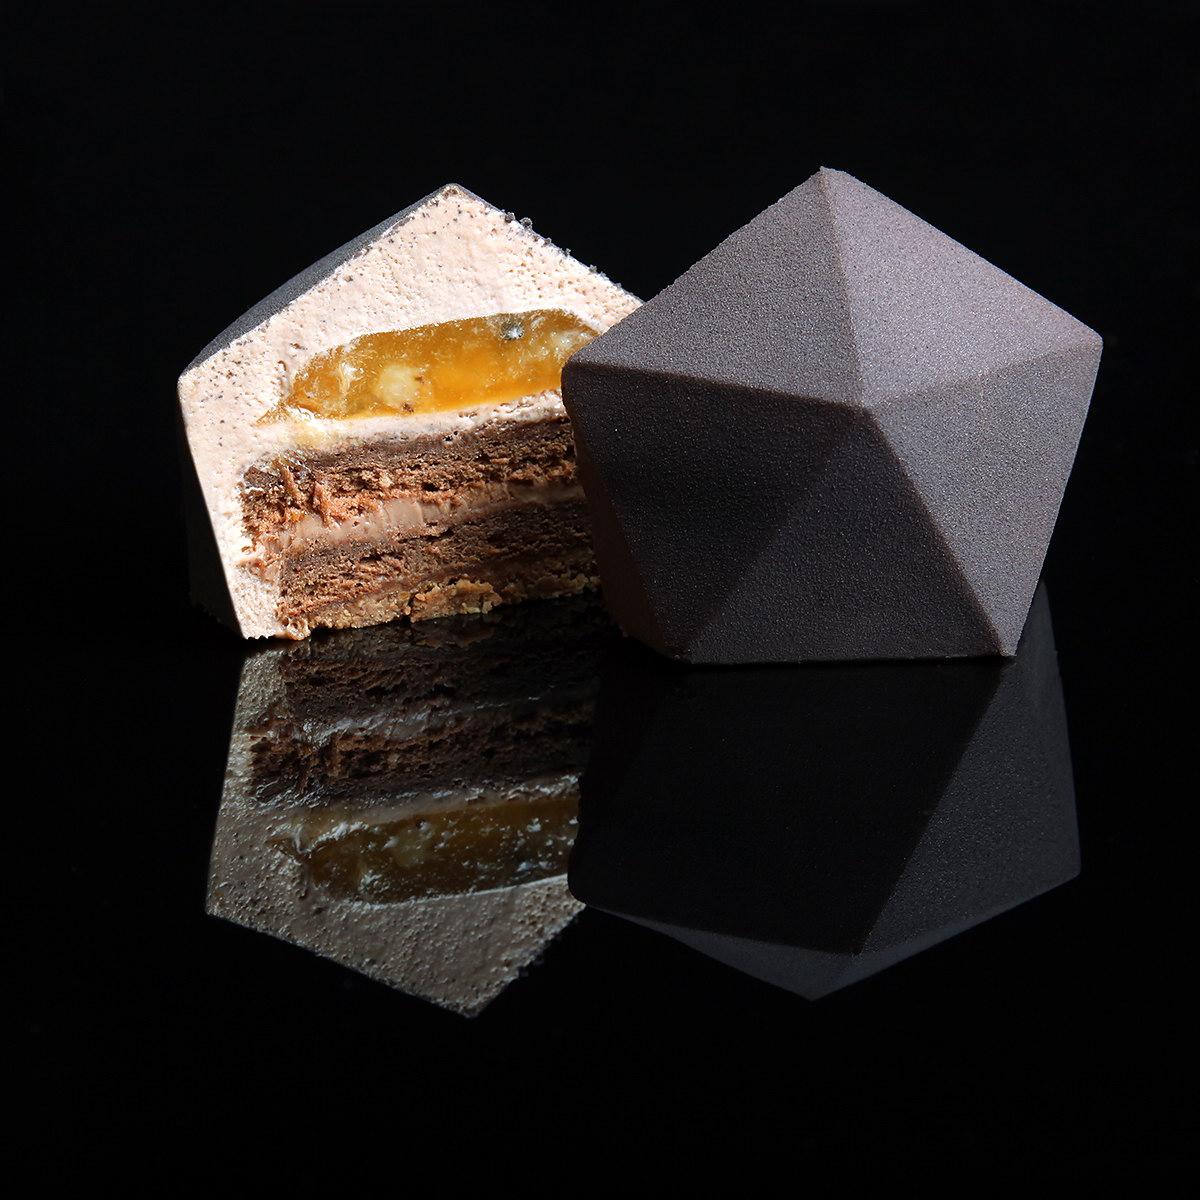 dinara kasko geometric desserts in 3d printed molds